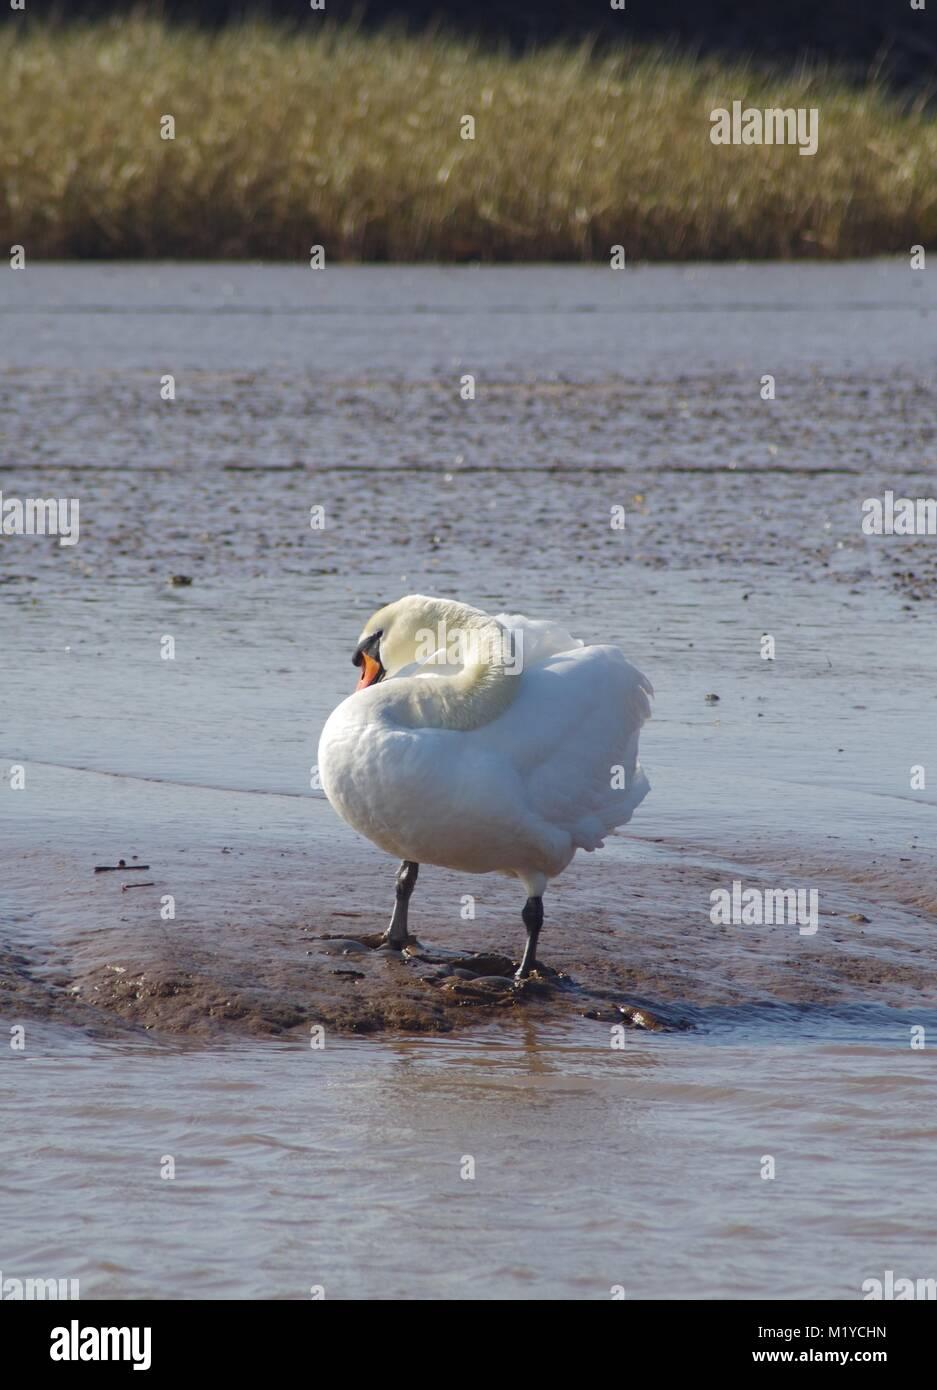 Elegant Mute Swan (Cygnus olor) Preening on the Mud Flat of the Exe Estuary by Turf Lock Hotel. South Devon, UK. - Stock Image